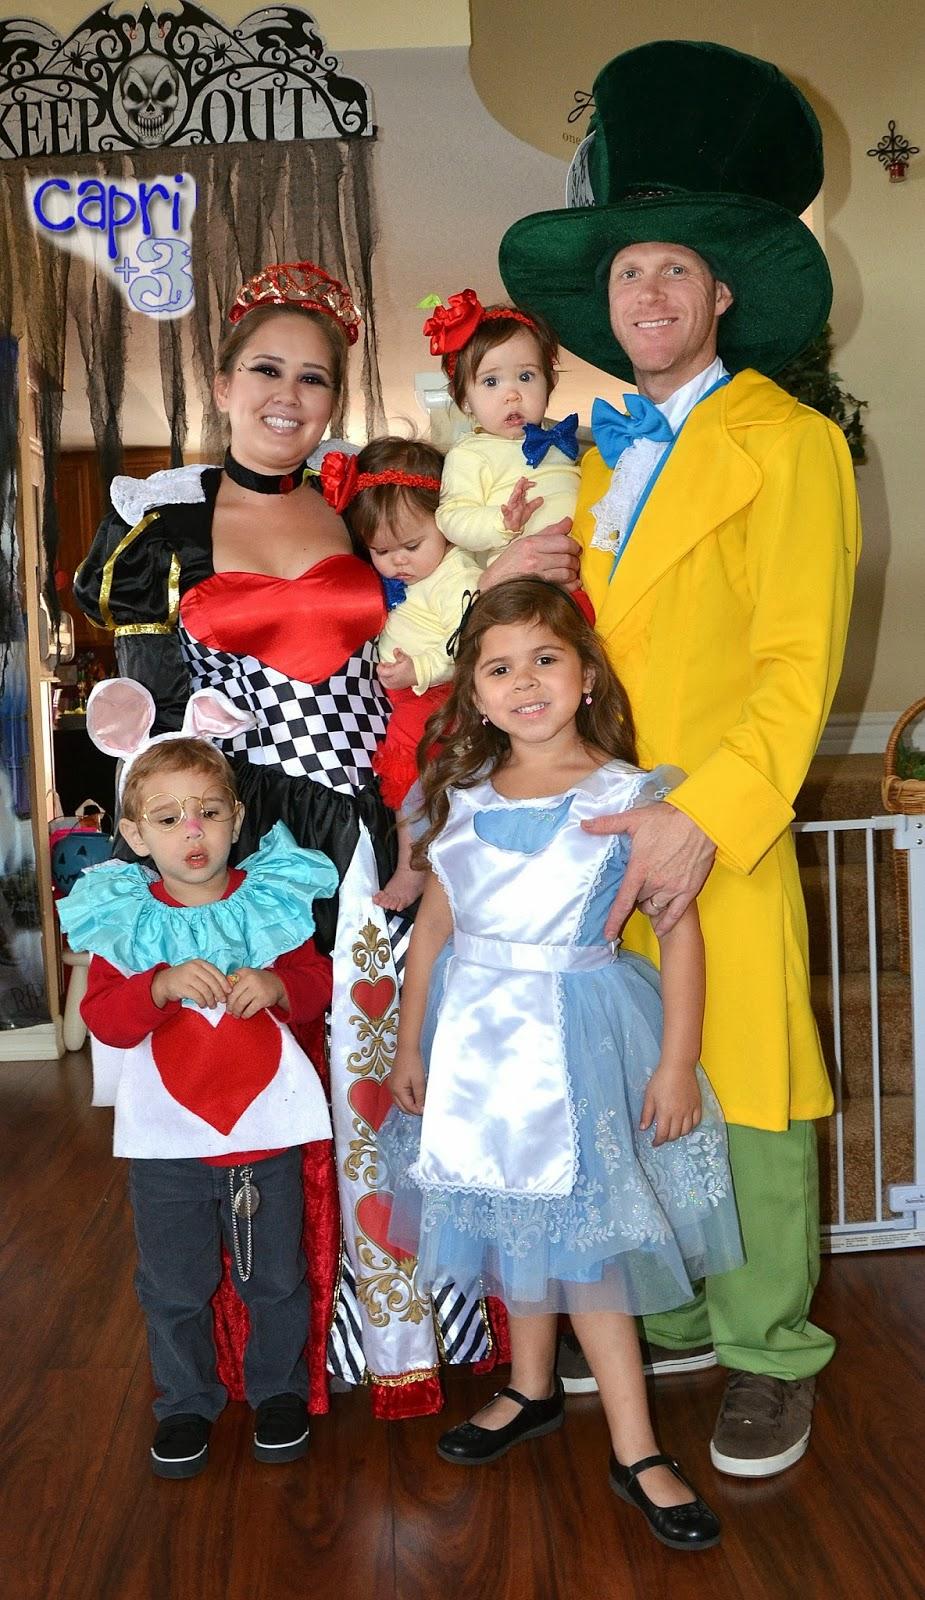 Alice In Wonderland Halloween Costume Family.A Multiples Halloween Party Capri 3